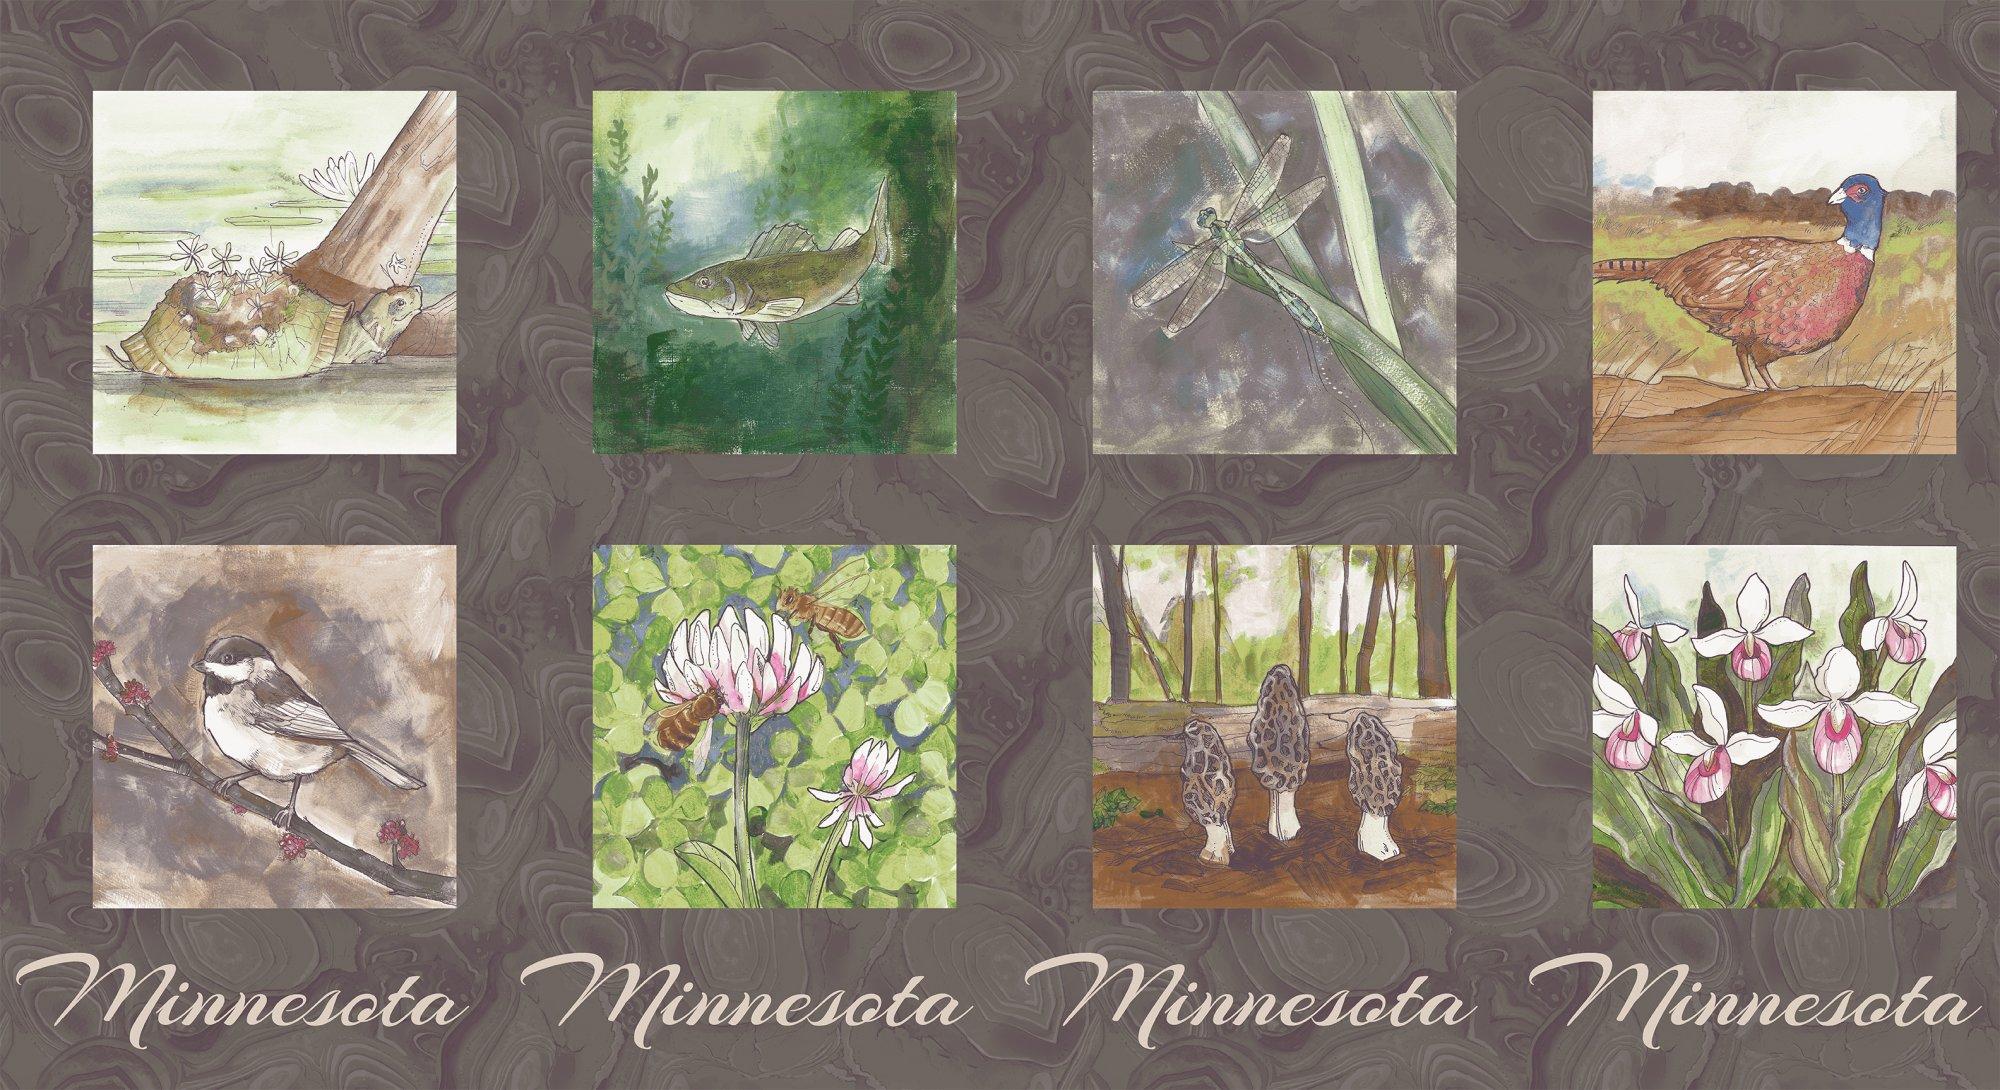 2017 Quilt Minnesota 8 x 8 Panel - Dark Taupe